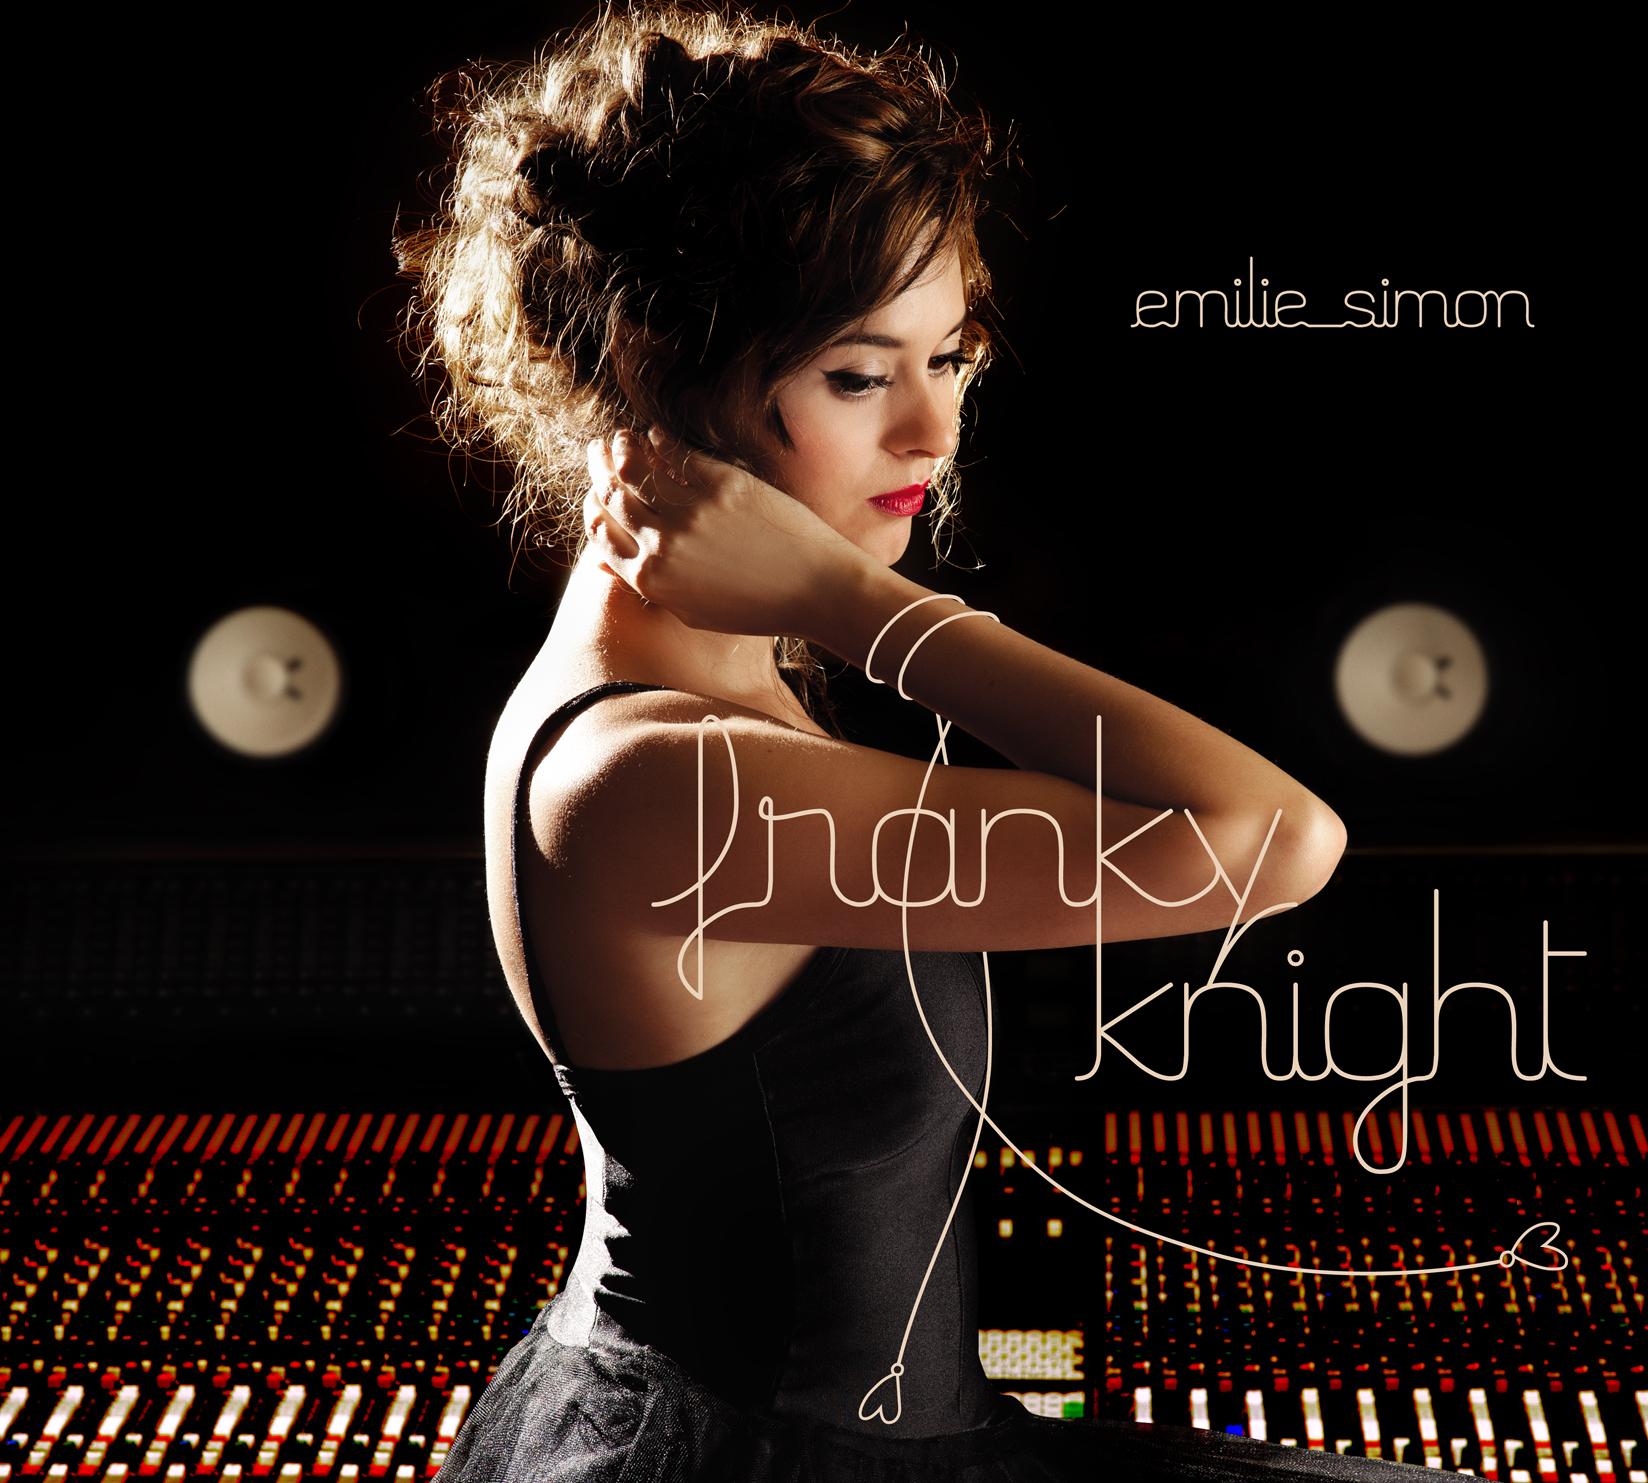 EmilieSimon_FrankyKnight_HD